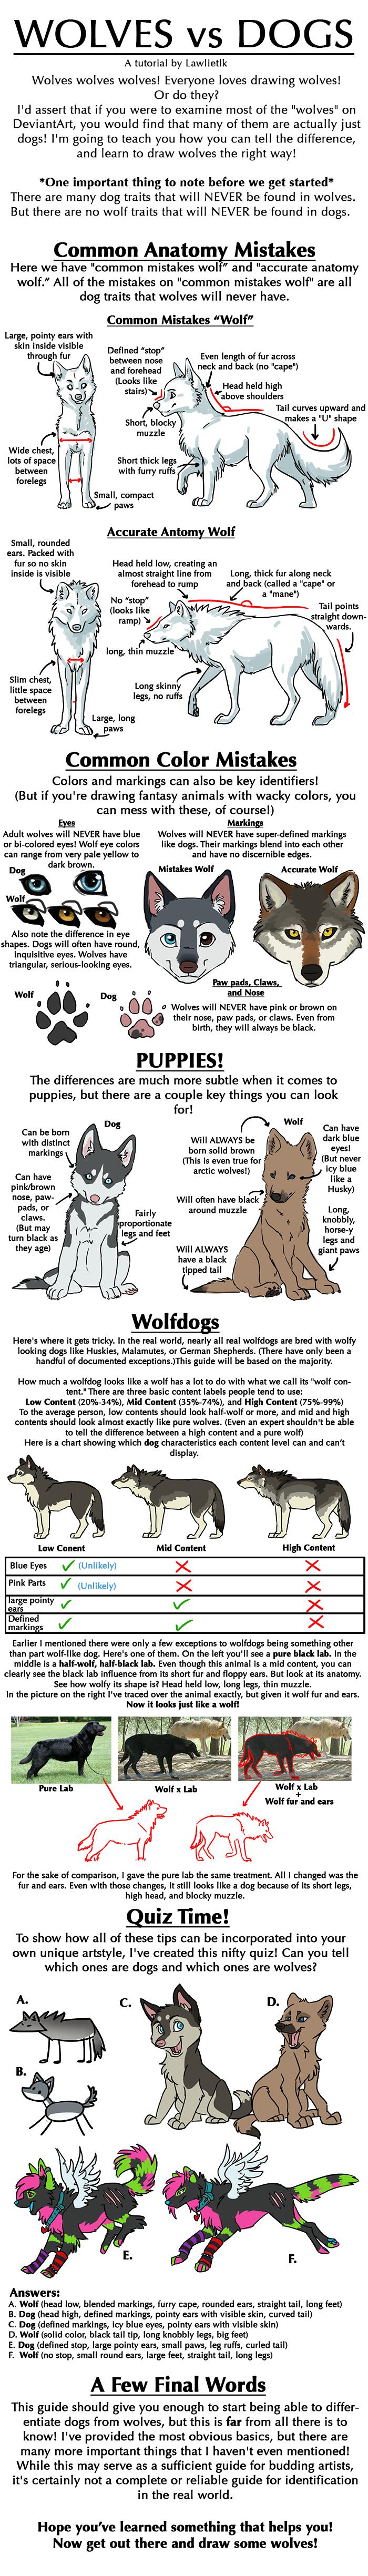 Wolves vs Dogs Tutorial by lawlietlk on DeviantArt